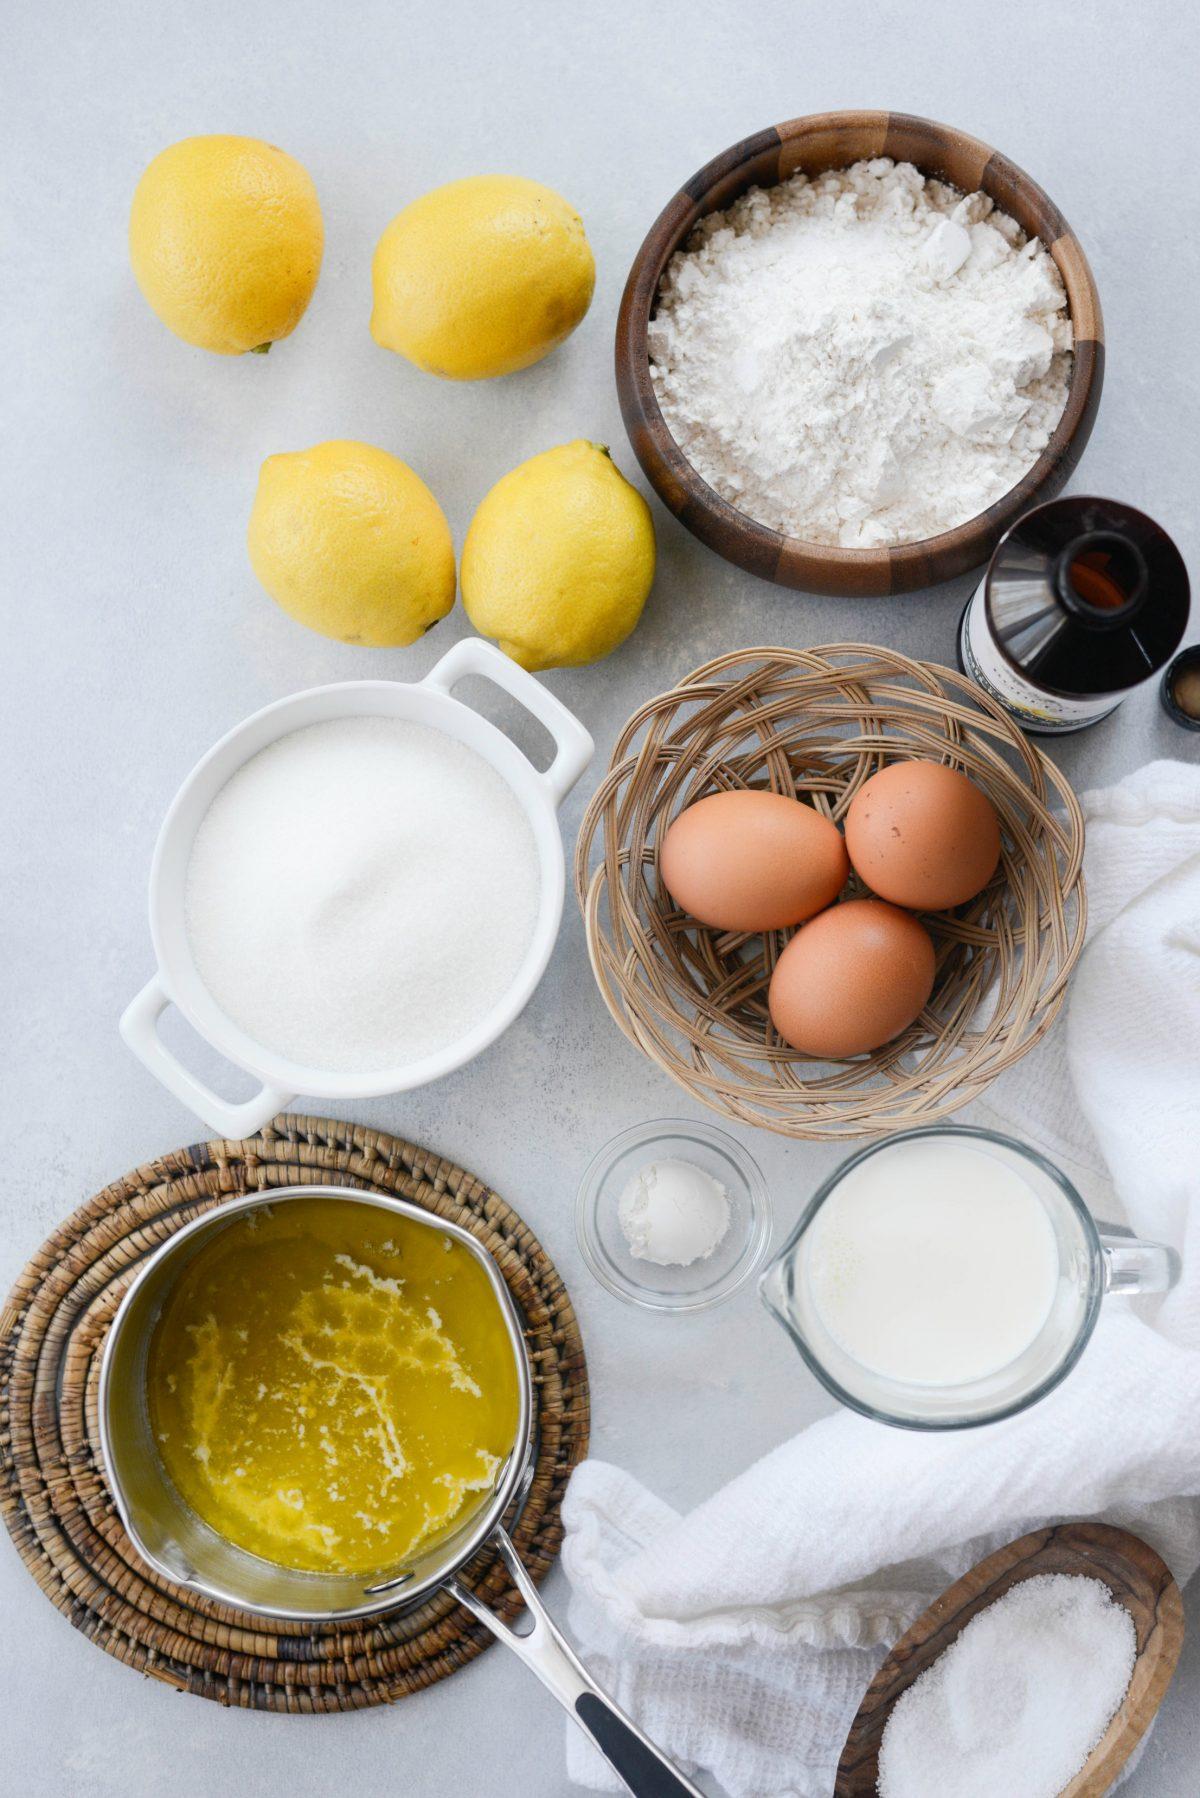 Glazed Lemon Cake ingredients l Simply Scratch.com #glazed #lemon #cake #loaf #starbucks #copycat #simple #dessert